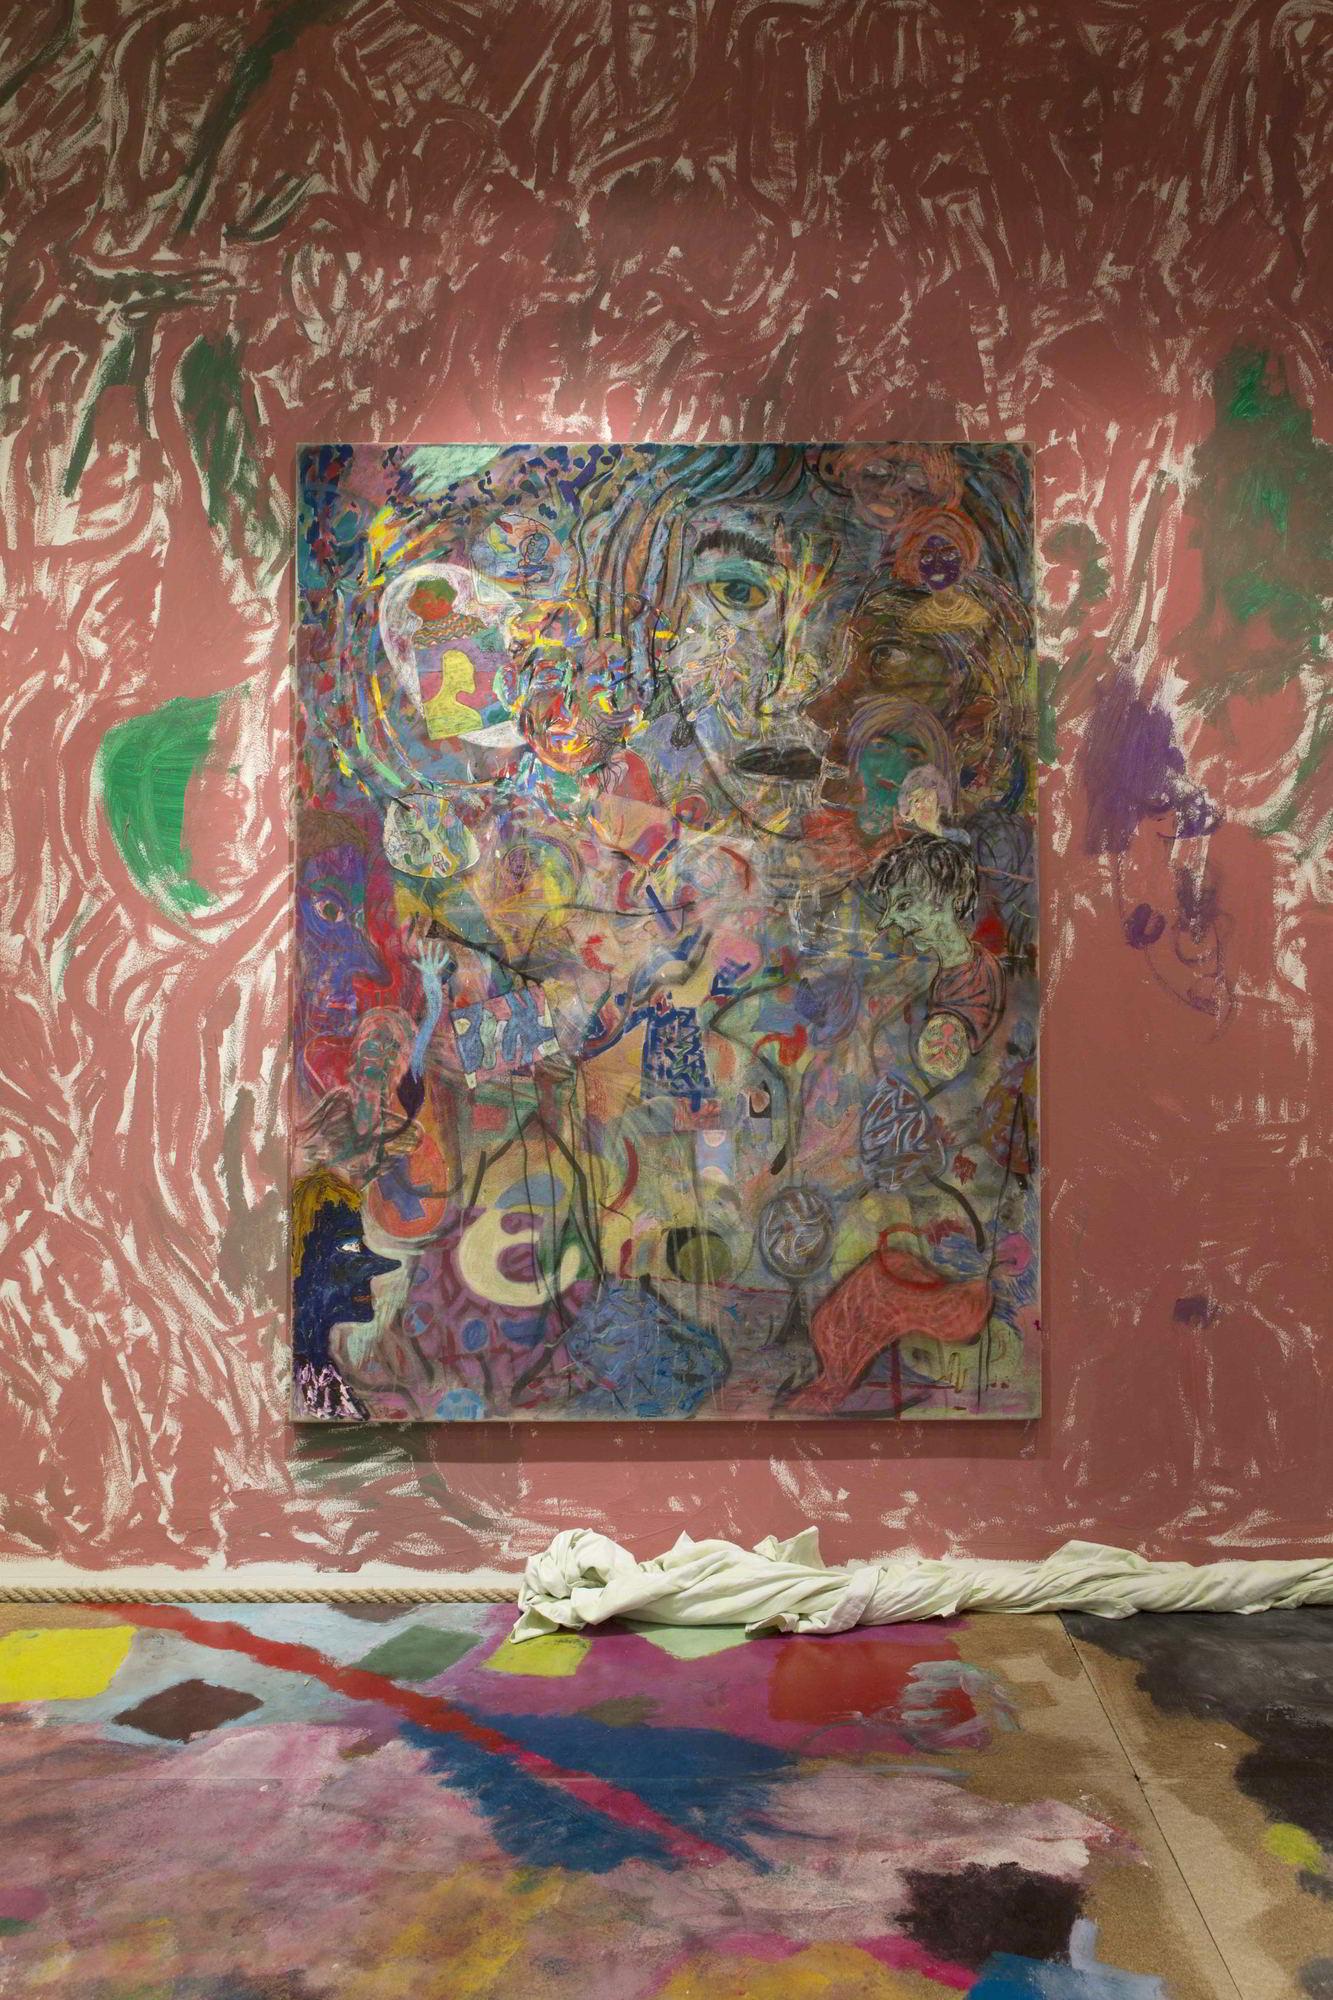 max brand at galerie bernhard art viewer